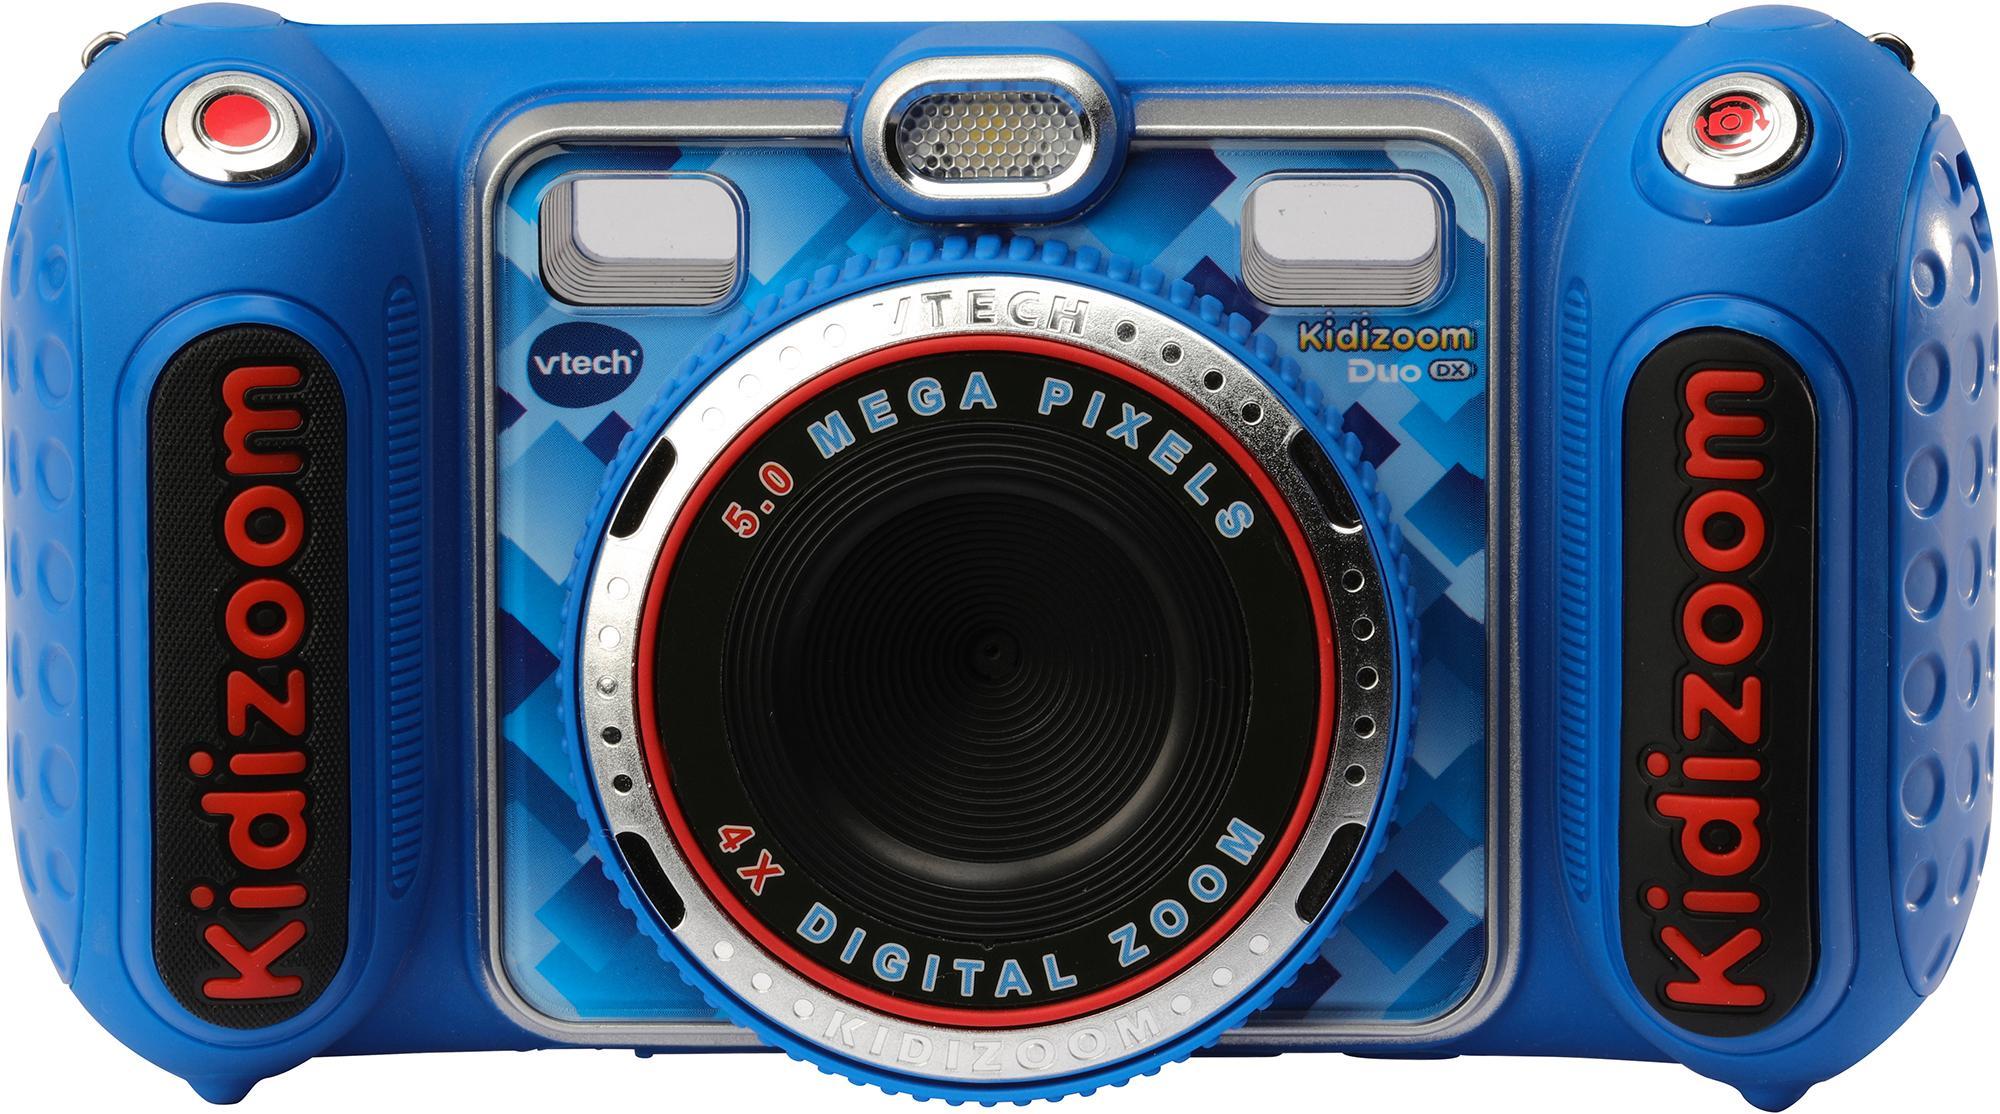 Vtech Kidizoom Duo DX blau Kinderkamera (5 MP) Kindermode/Spielzeug/Lernspielzeug/Kinder-Computer